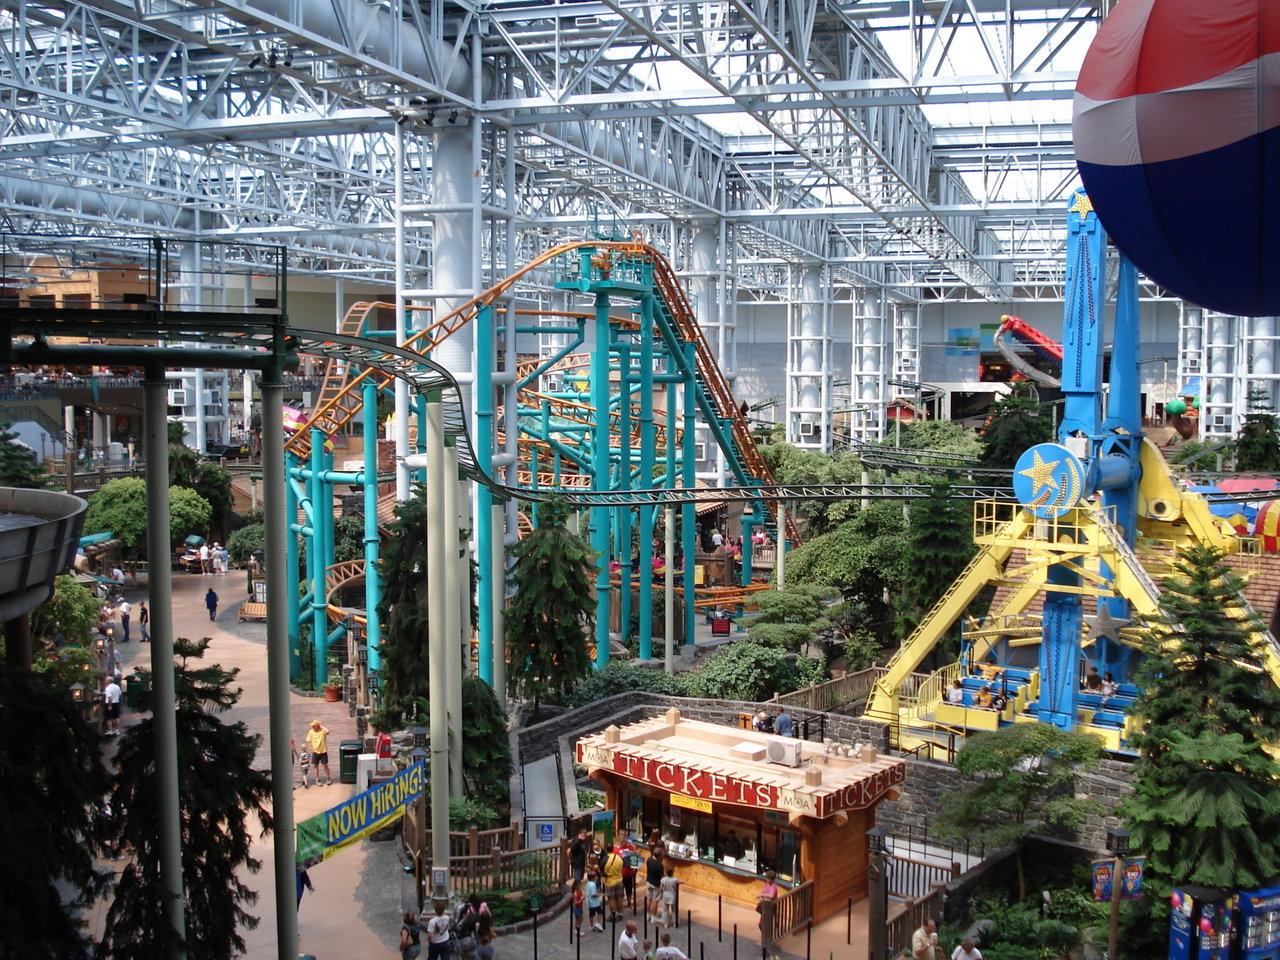 mall of america - photo #5